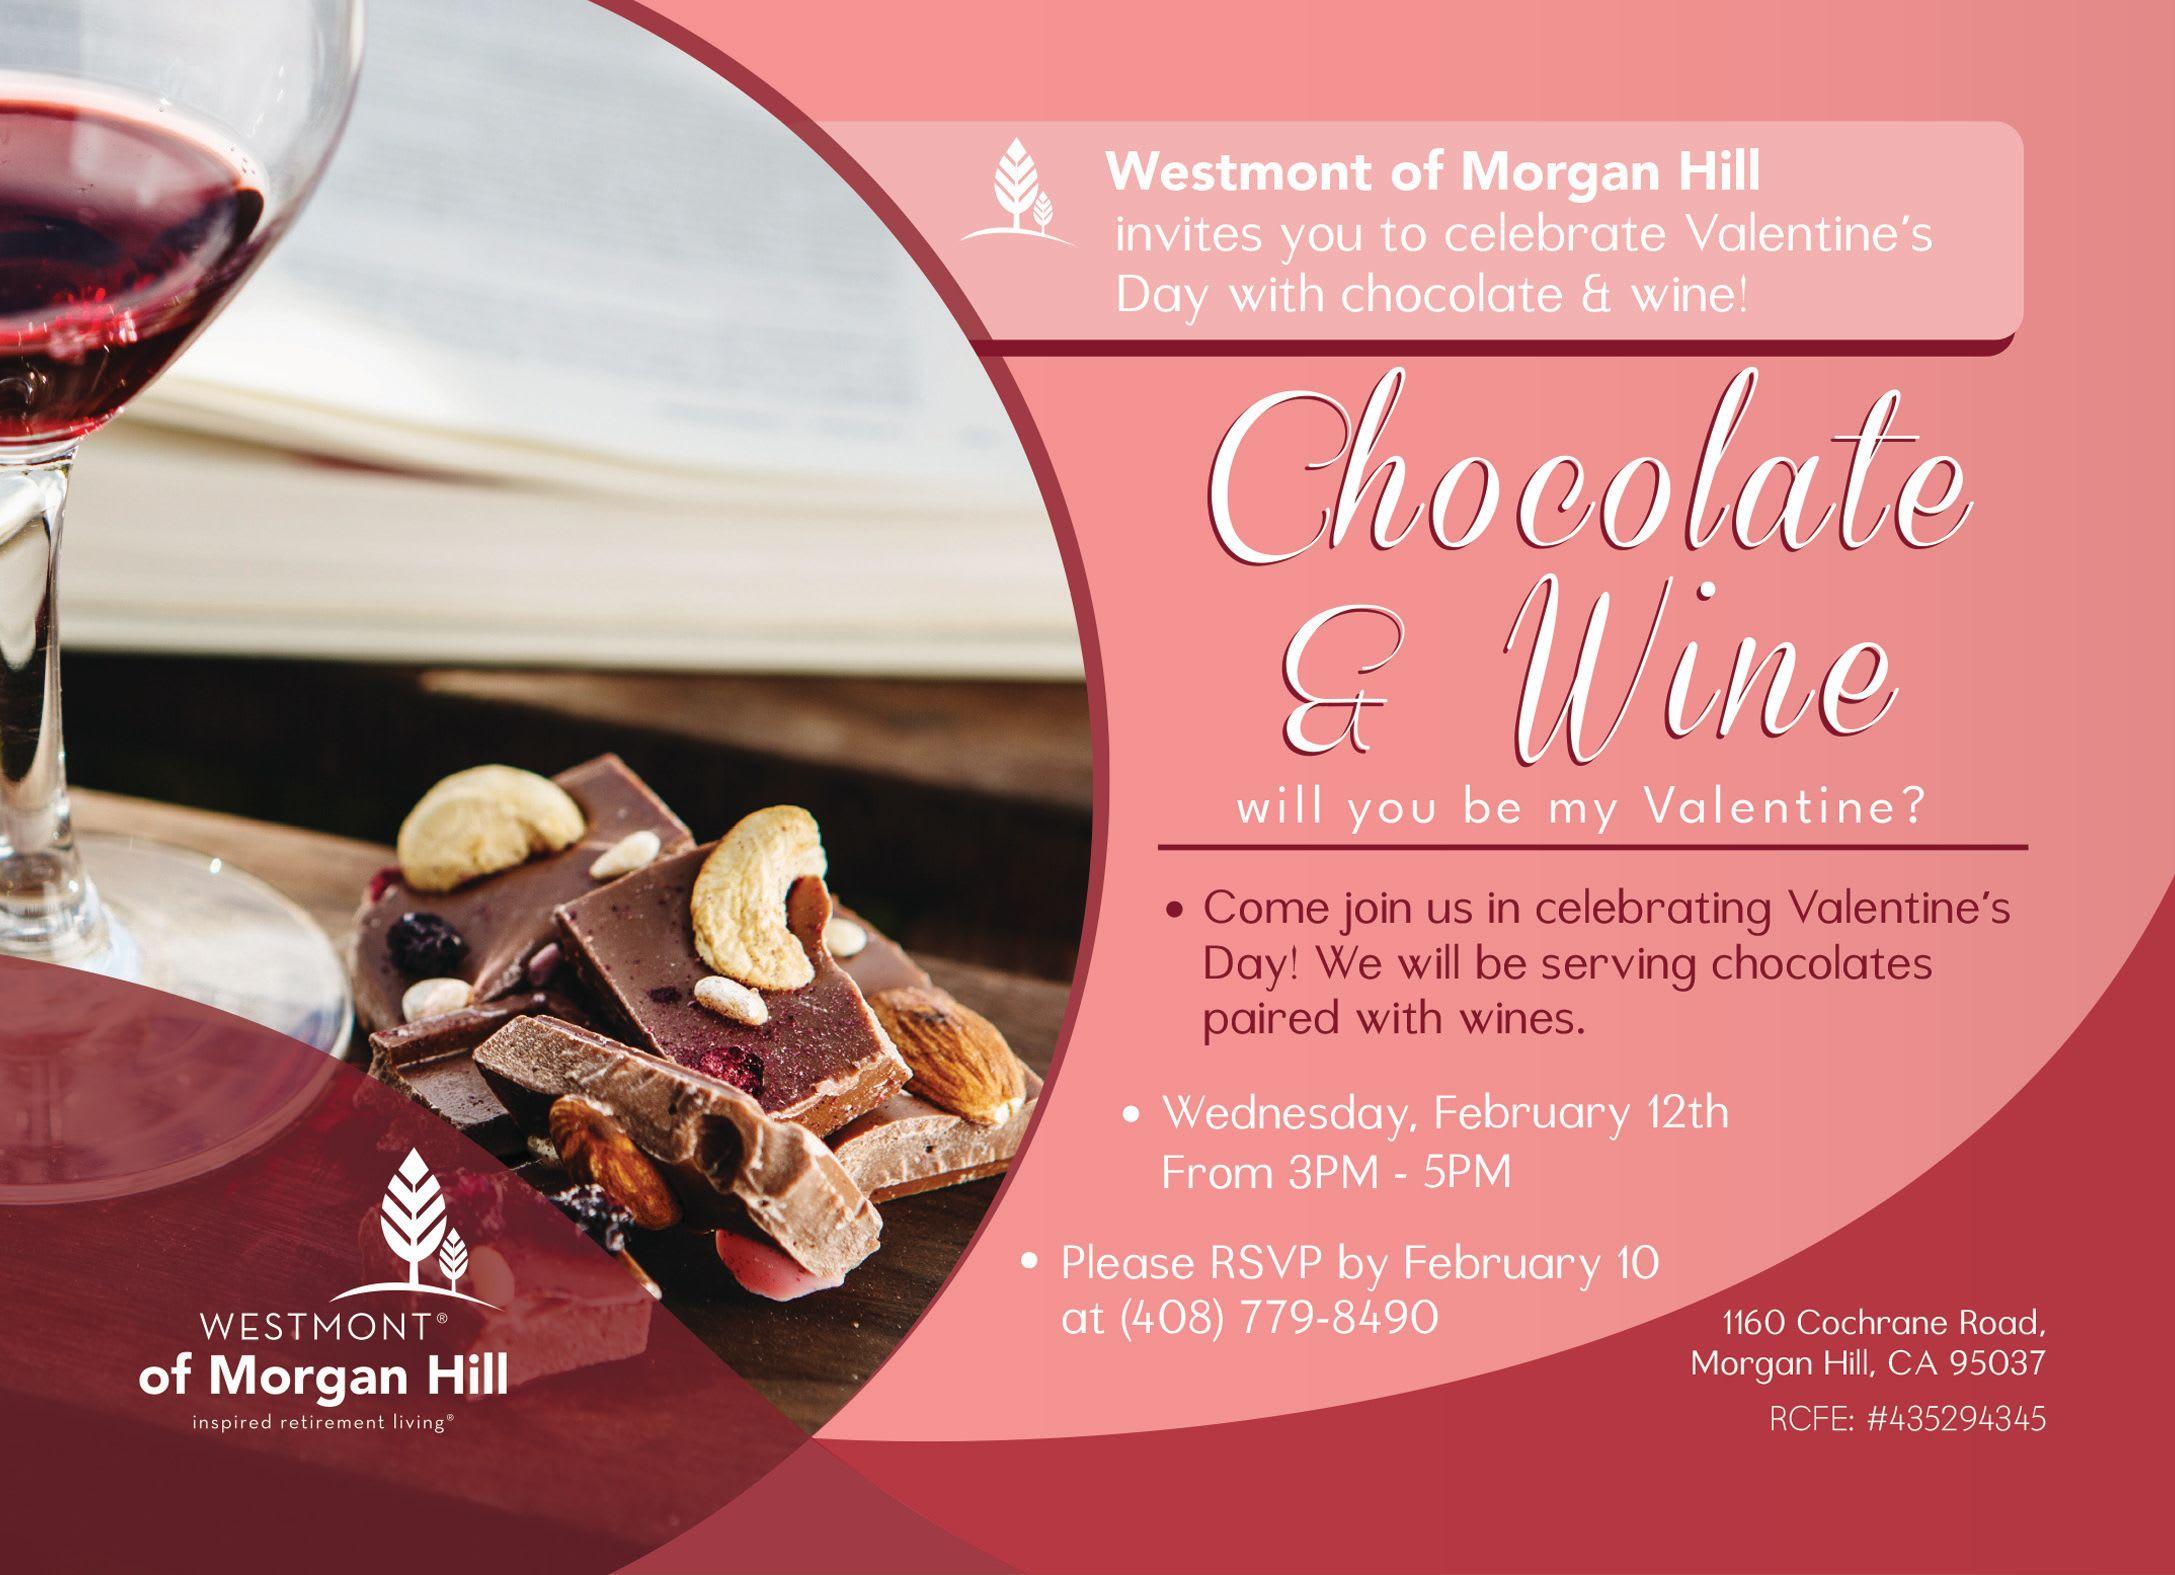 Chocolate & Wine Westmont Morgan Hill